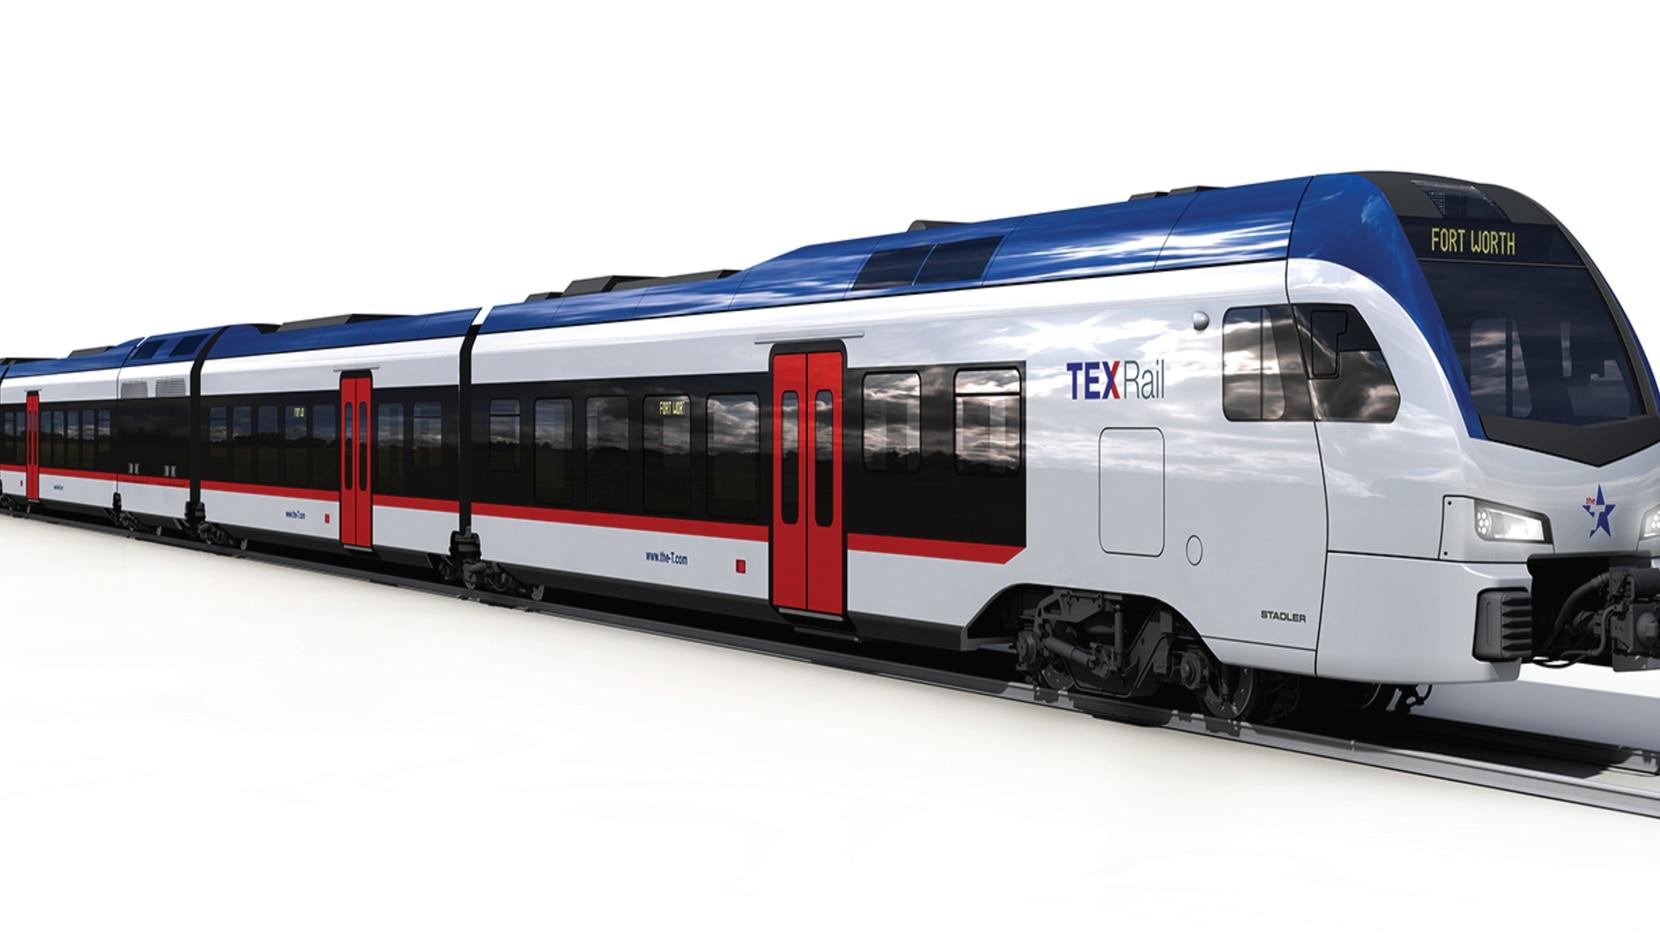 A rendering of a TEX Rail train